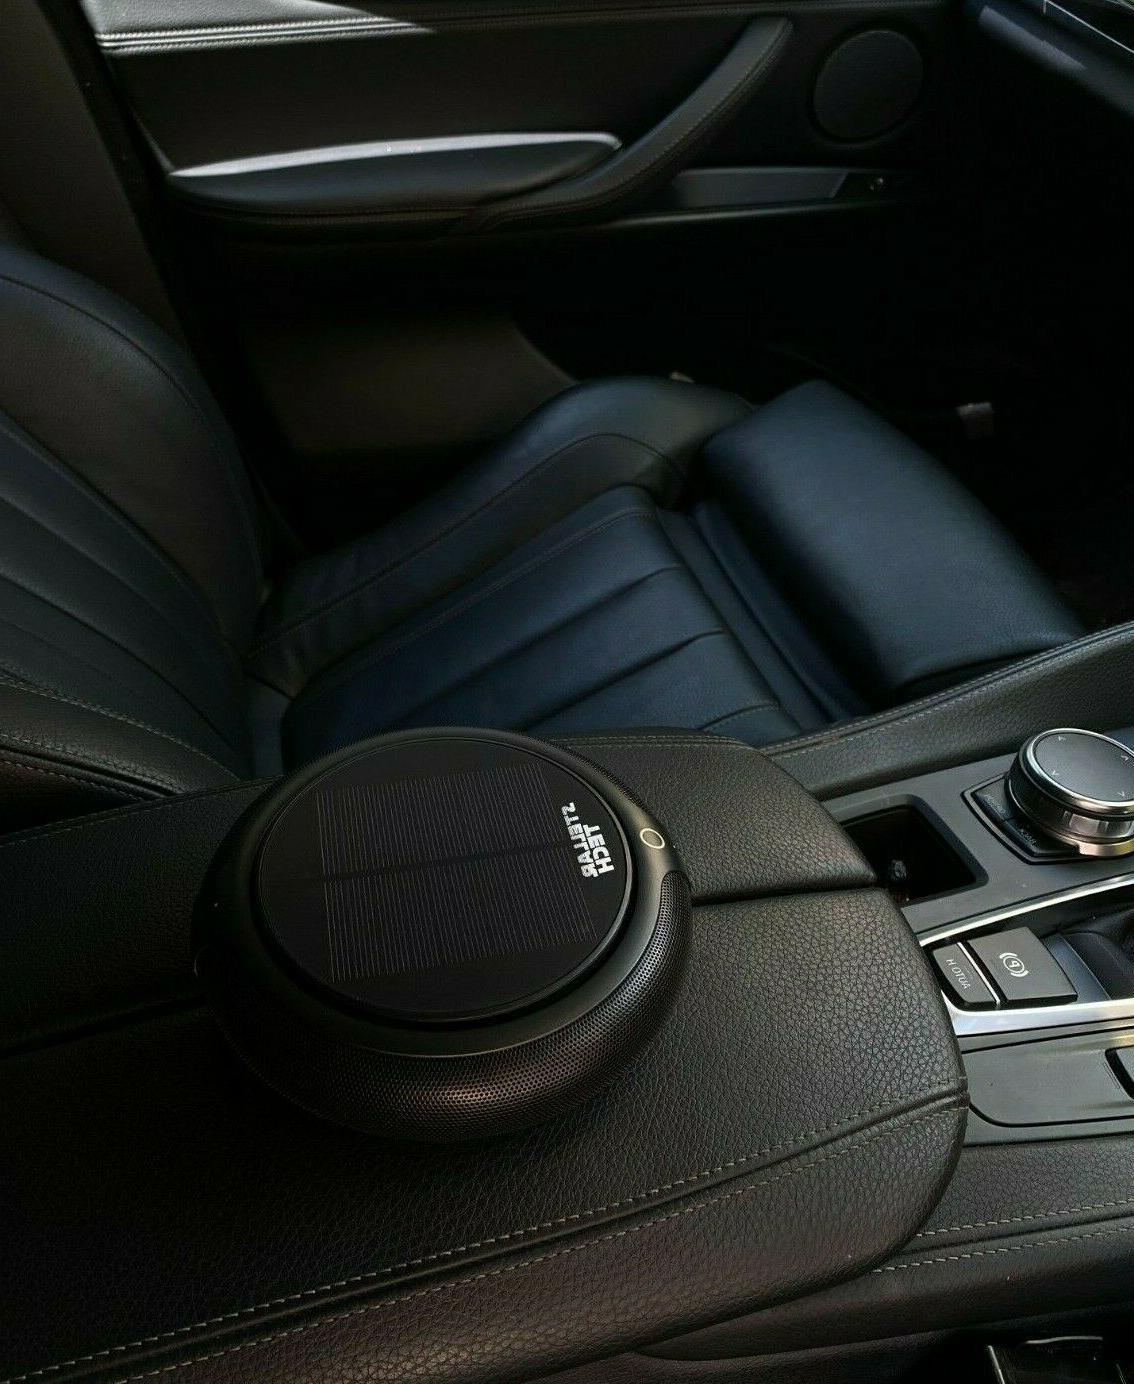 STELLAR TECH Portable Purifier Car, Office.